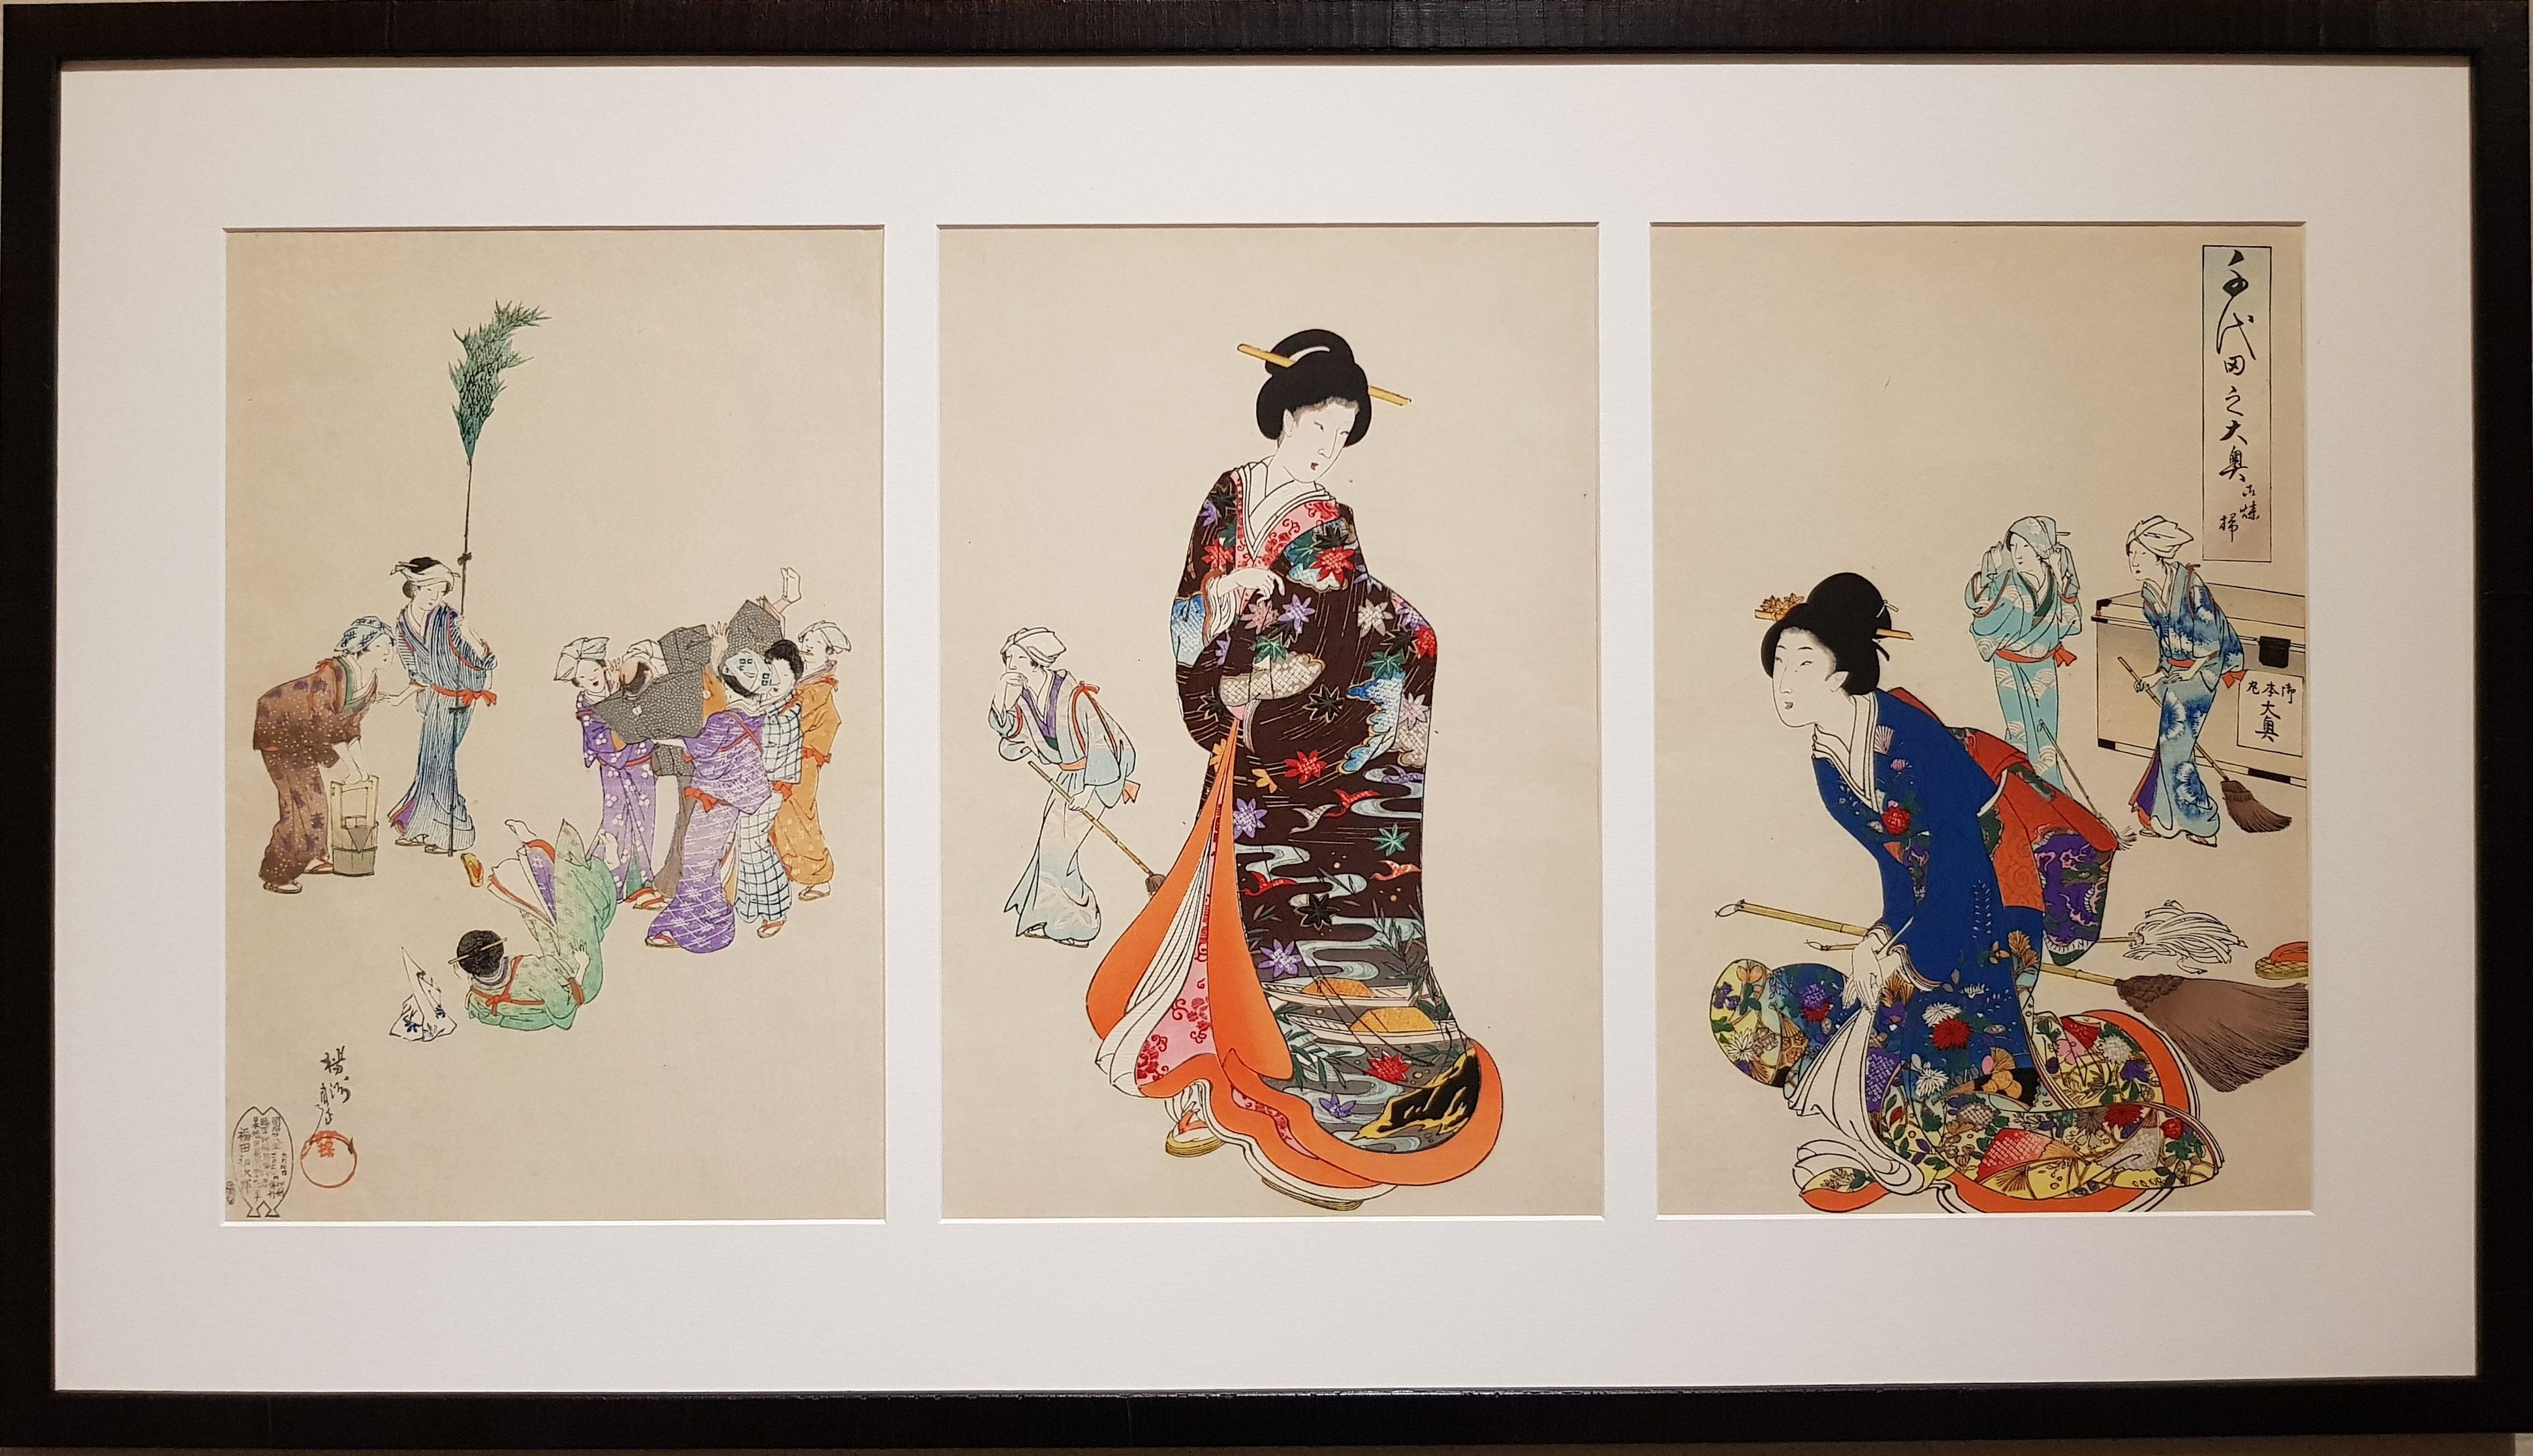 Japon - Estampe Triptyque Chikanobu - Chiyoda no O-oku - O-susuharai - 19ème - VENDU Image